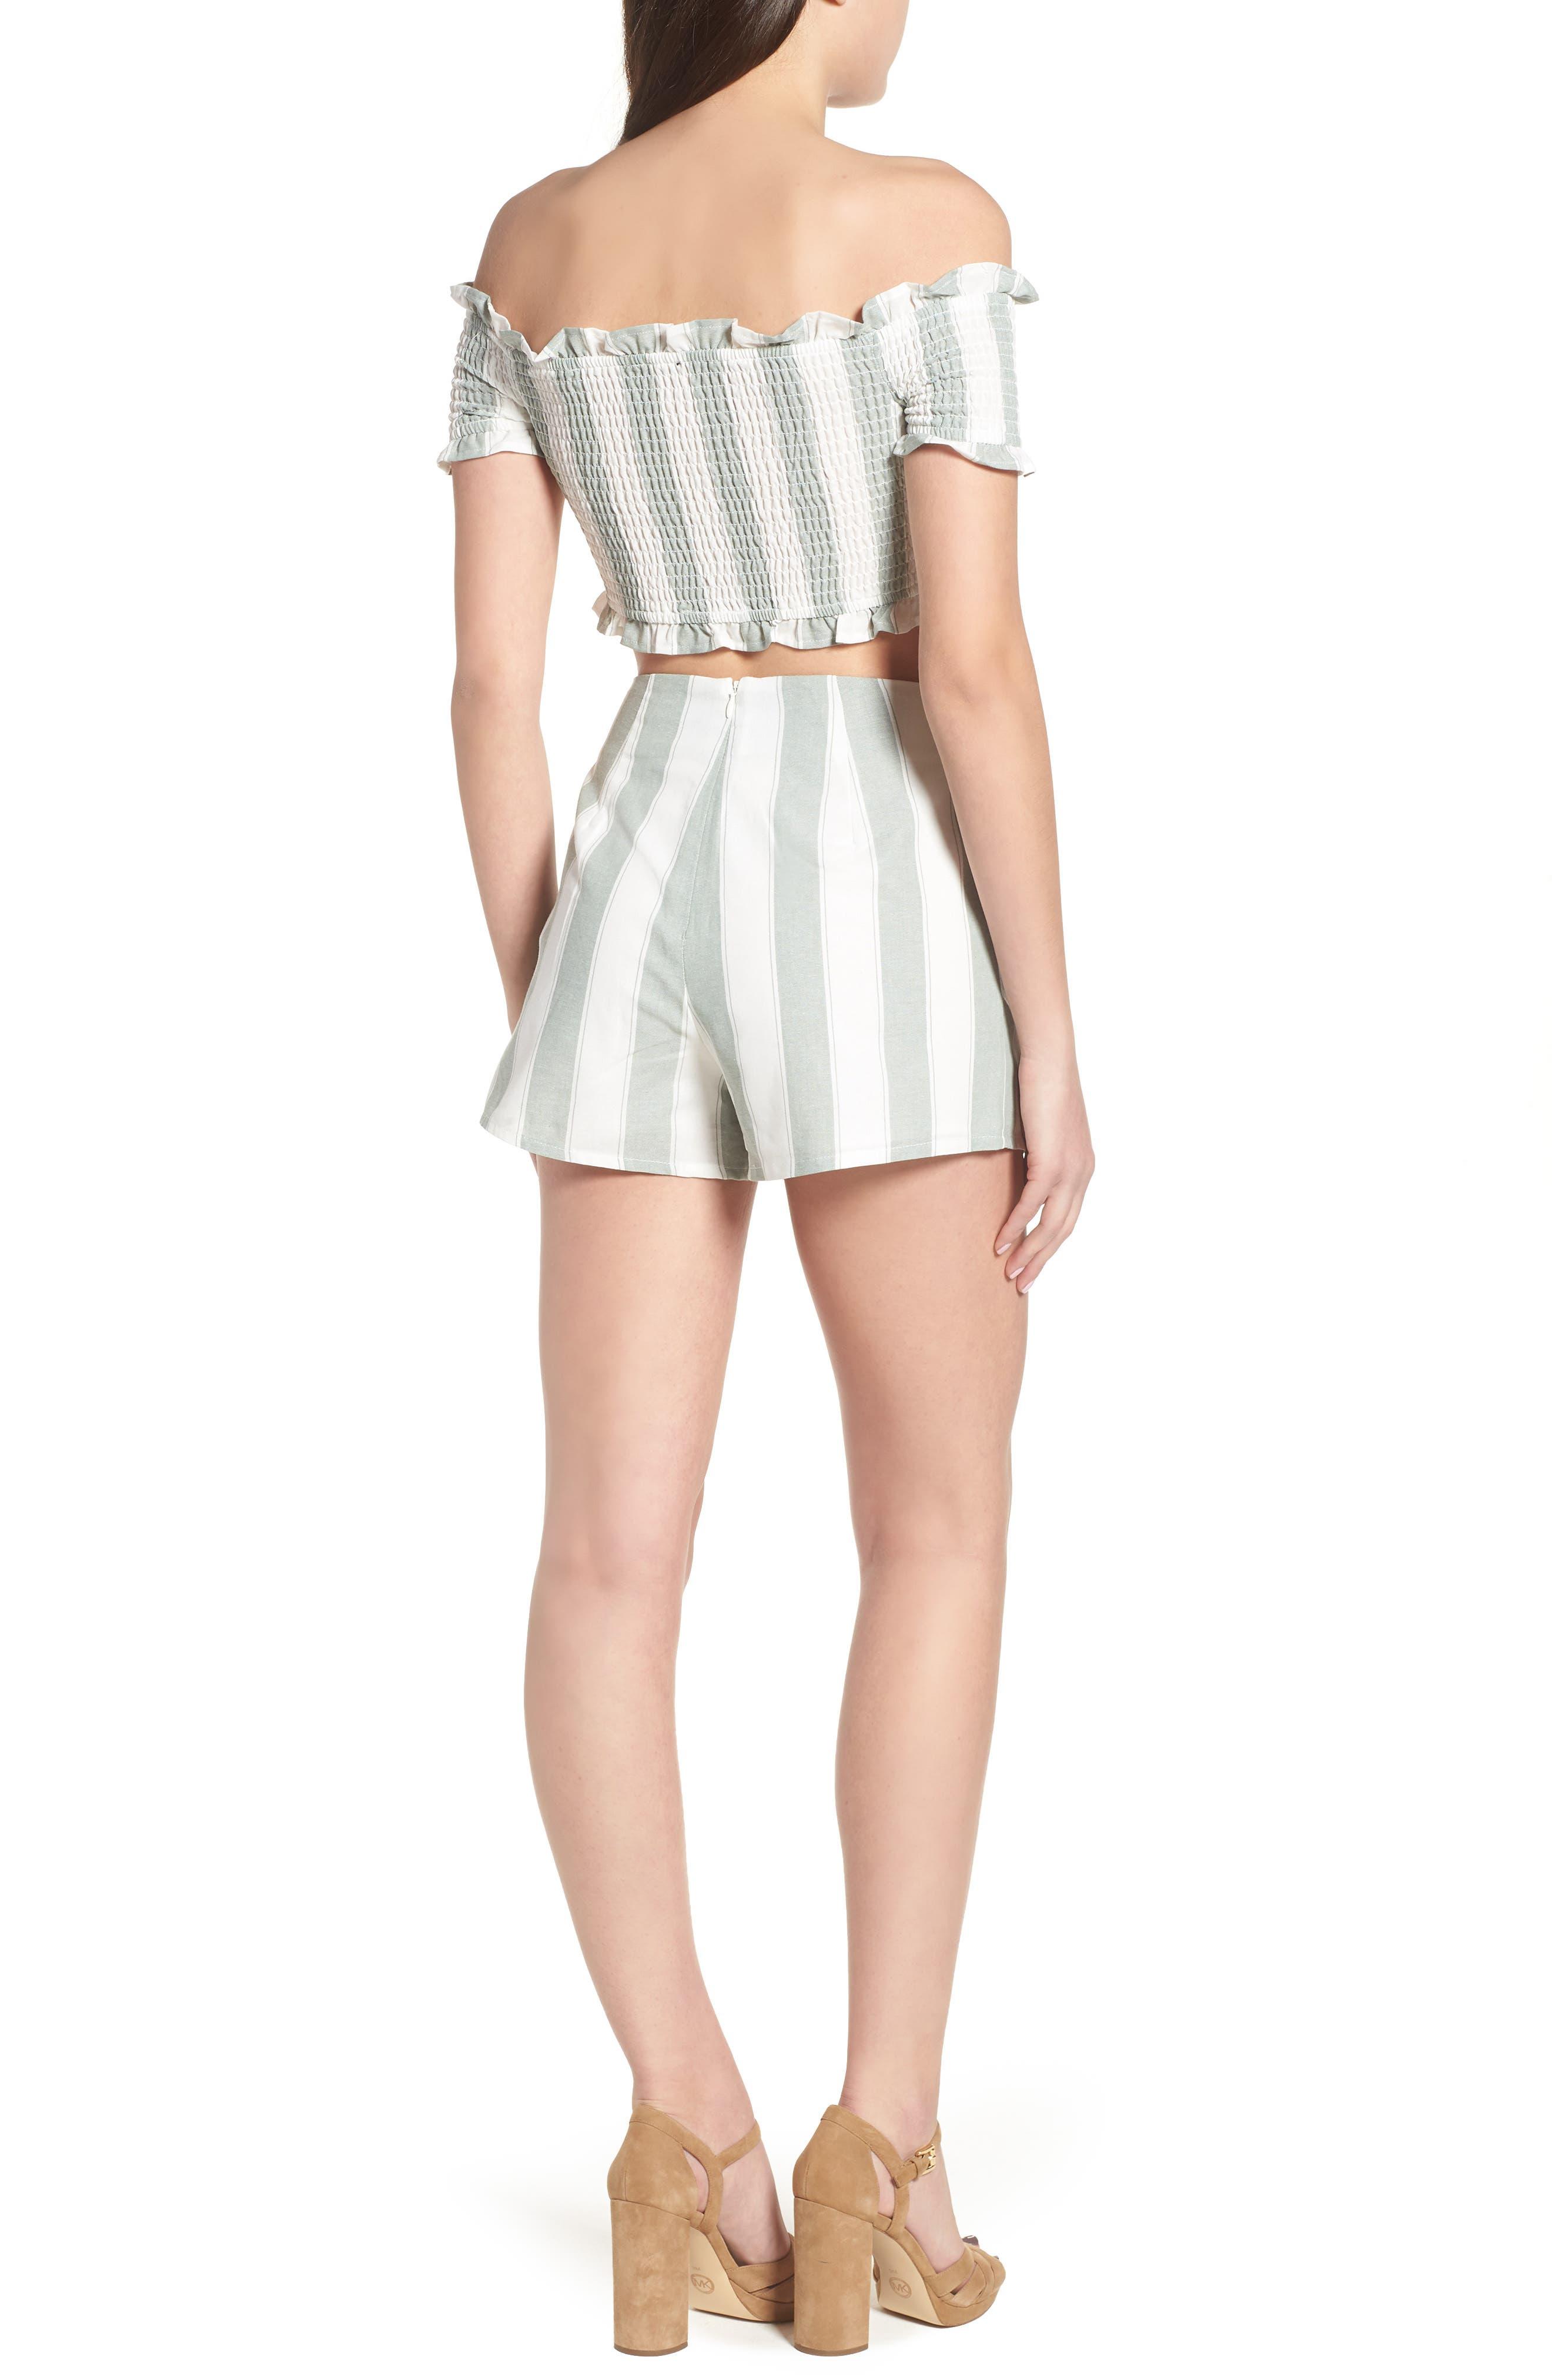 Poetic Stripe Shorts,                             Alternate thumbnail 8, color,